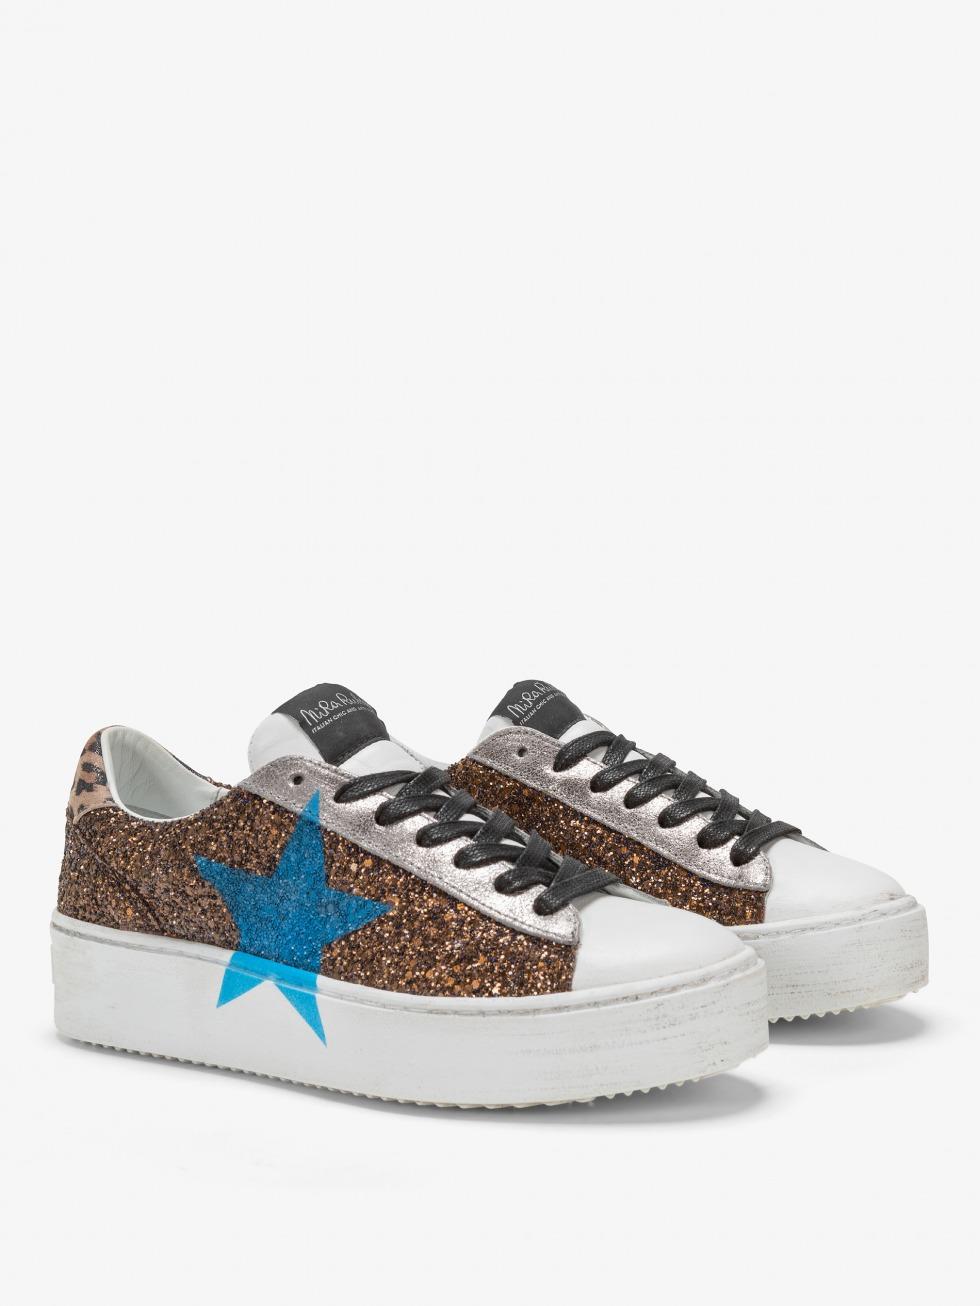 Cosmopolitan Leo Bronze Sneakers - Sky Star